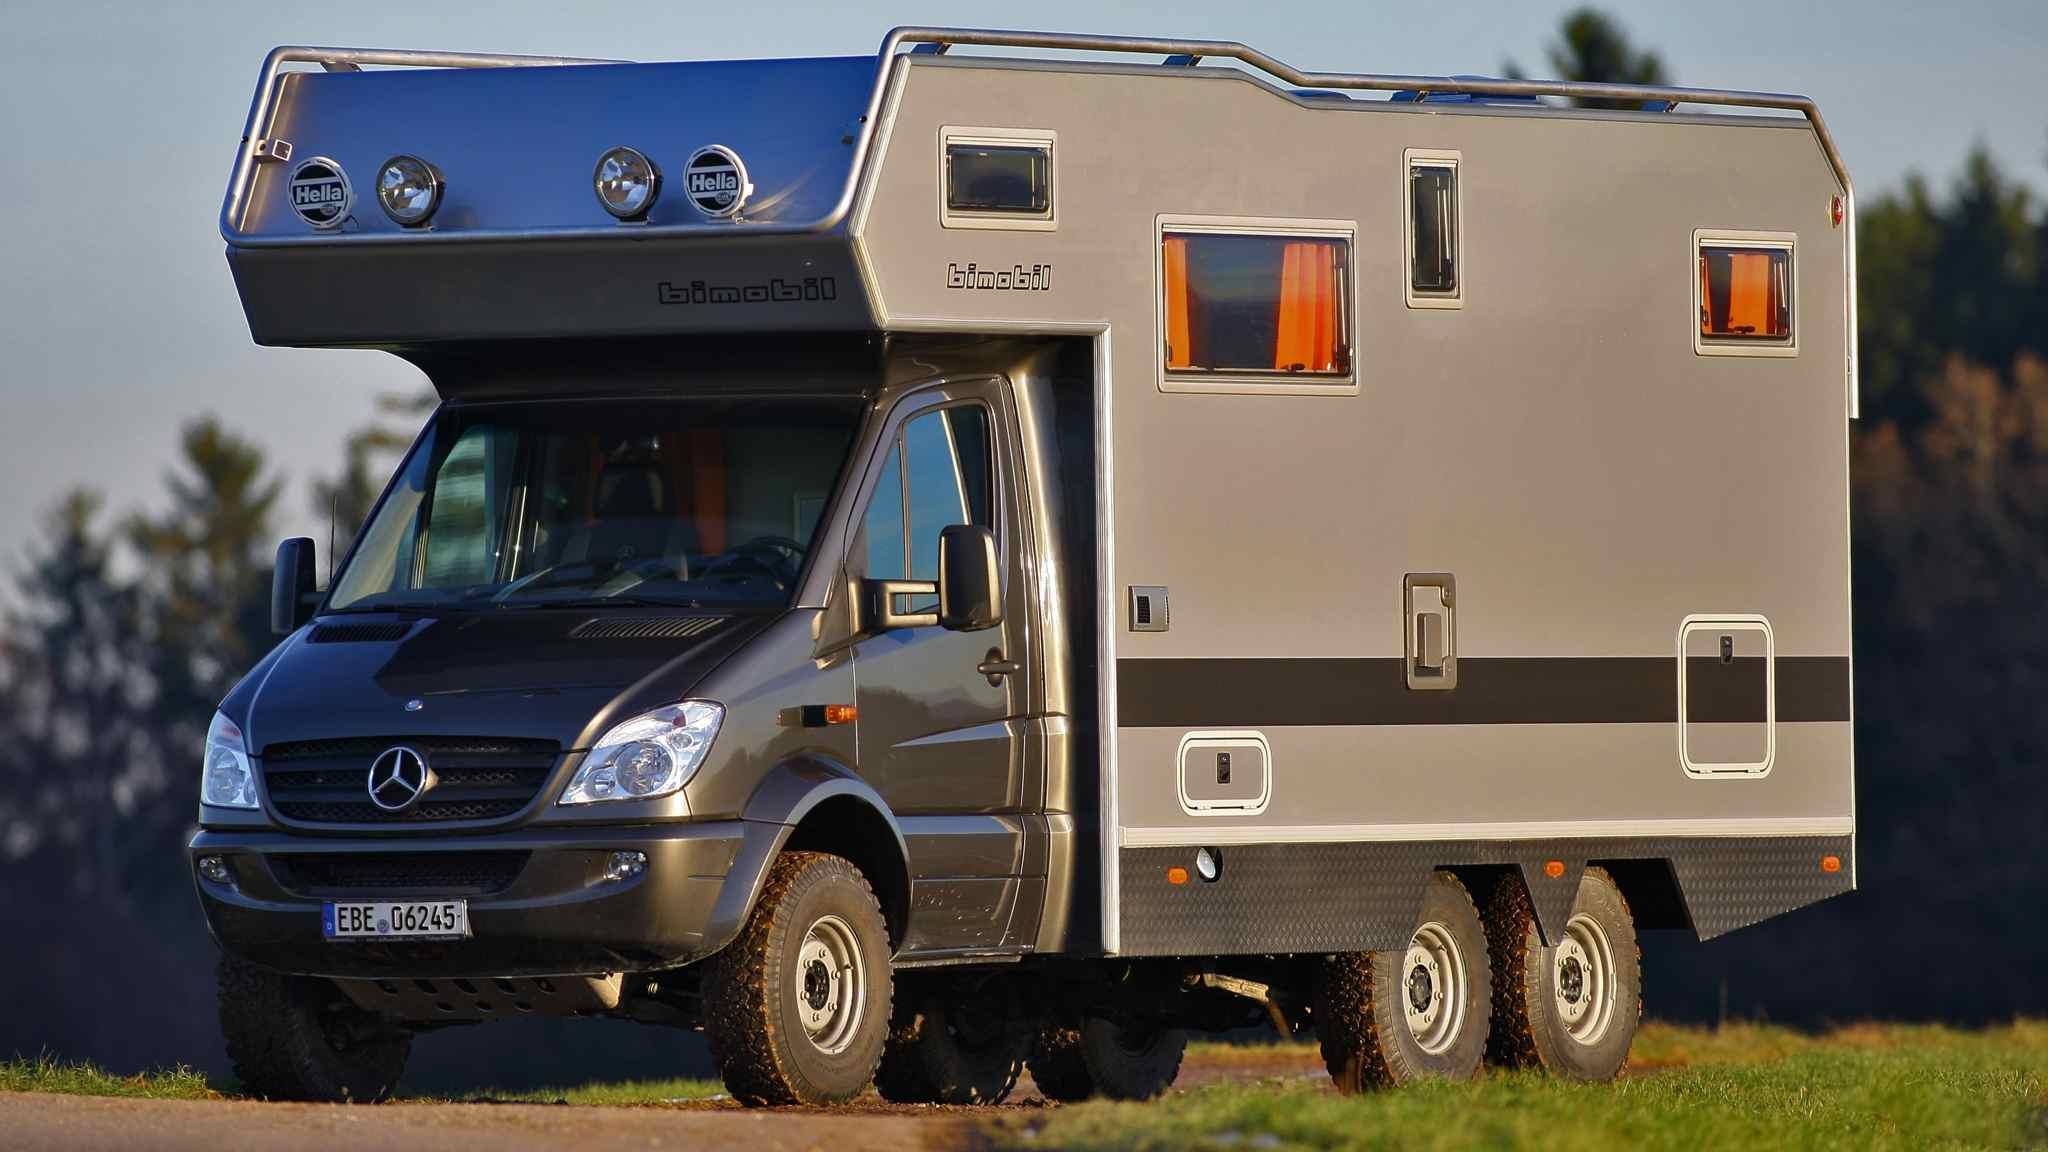 bimobil EX 510 - 6x6 Allradantrieb auf Mercedes Sprinter Basis